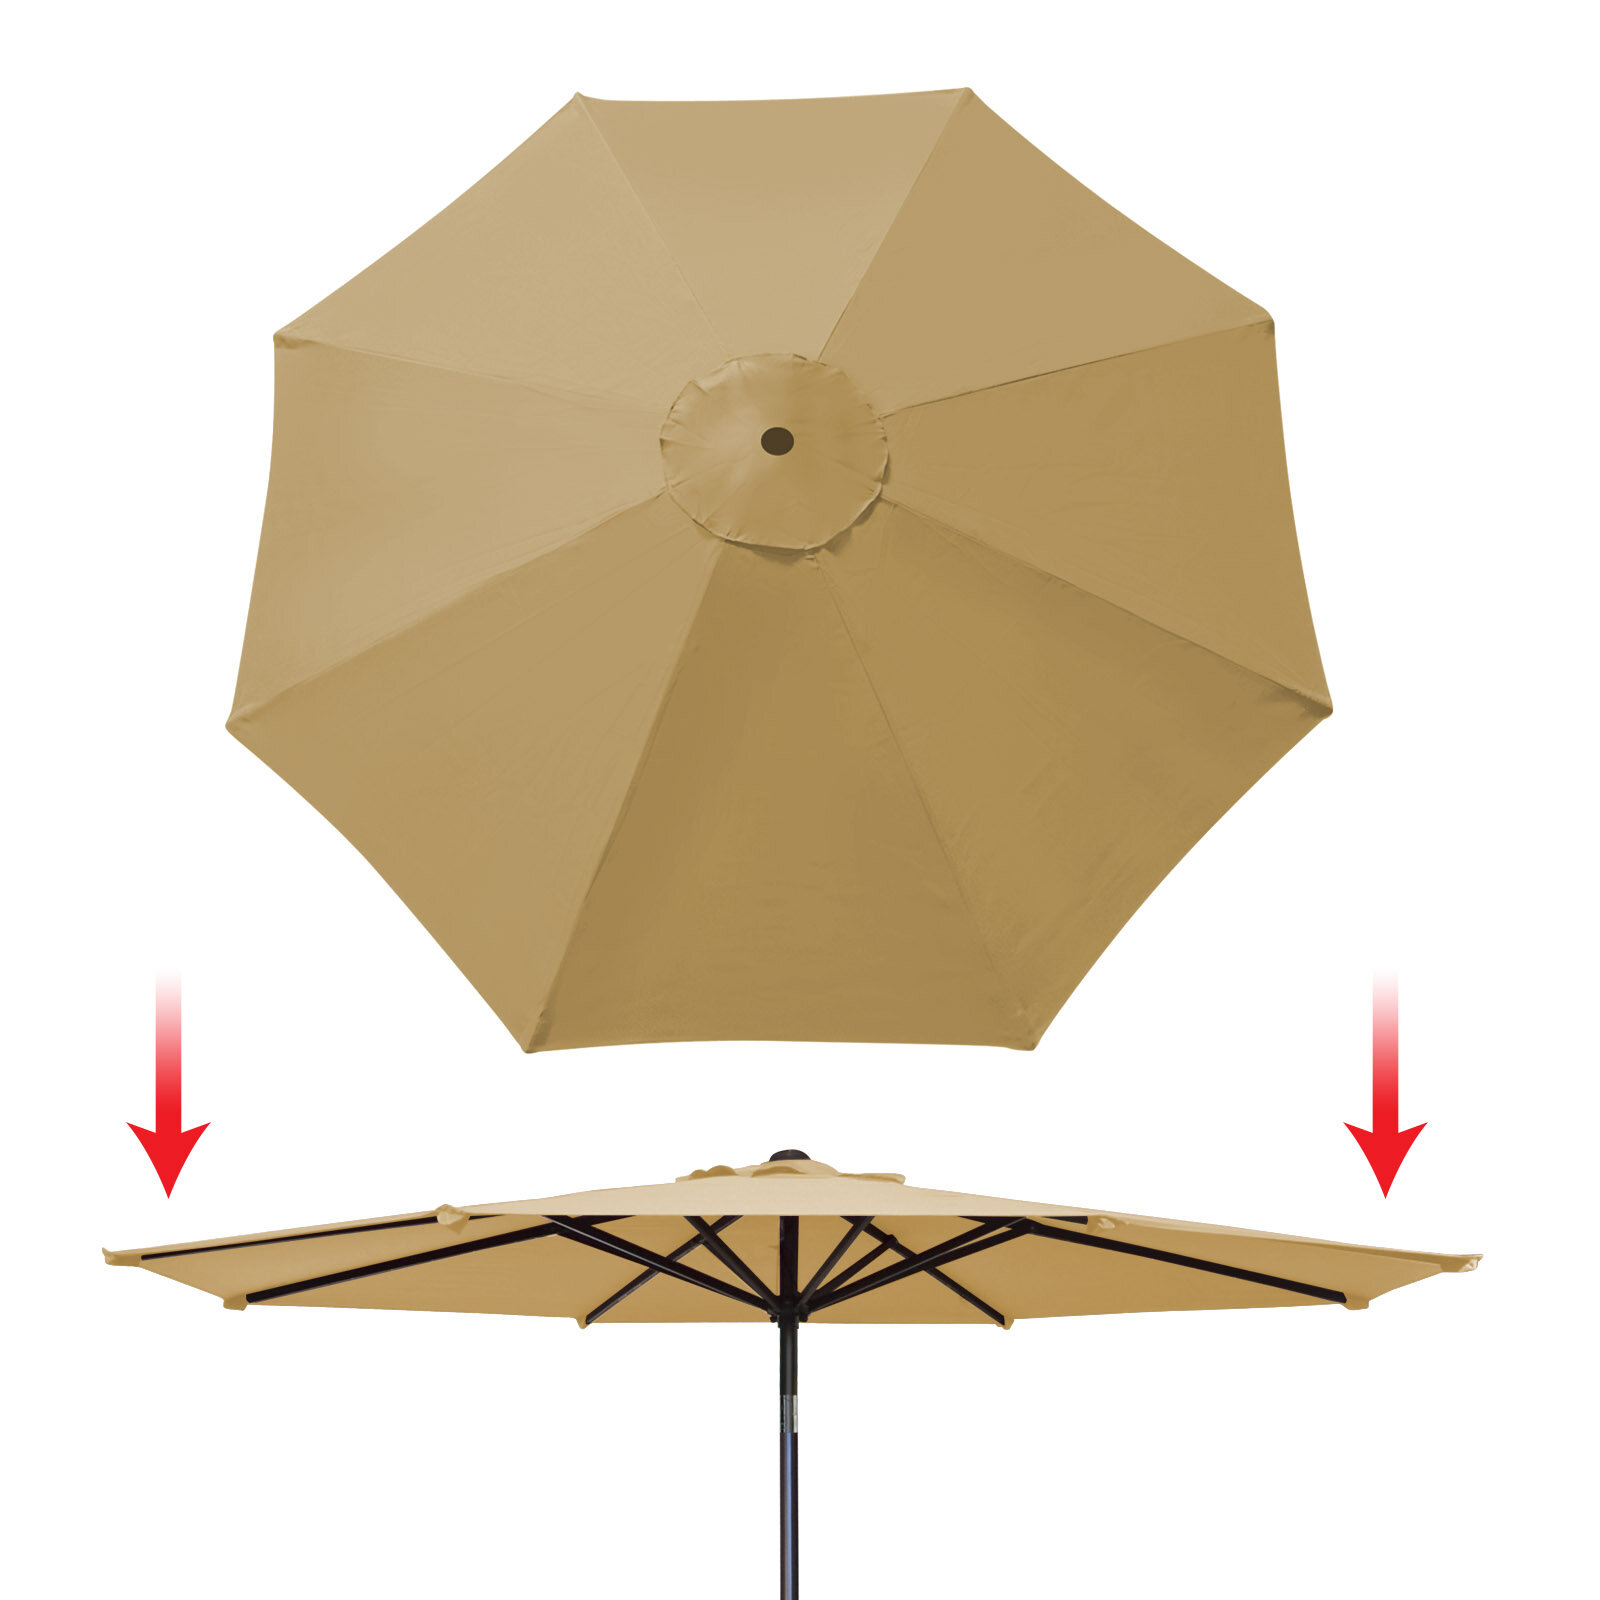 Tierra Patio Umbrella Replacement Cover